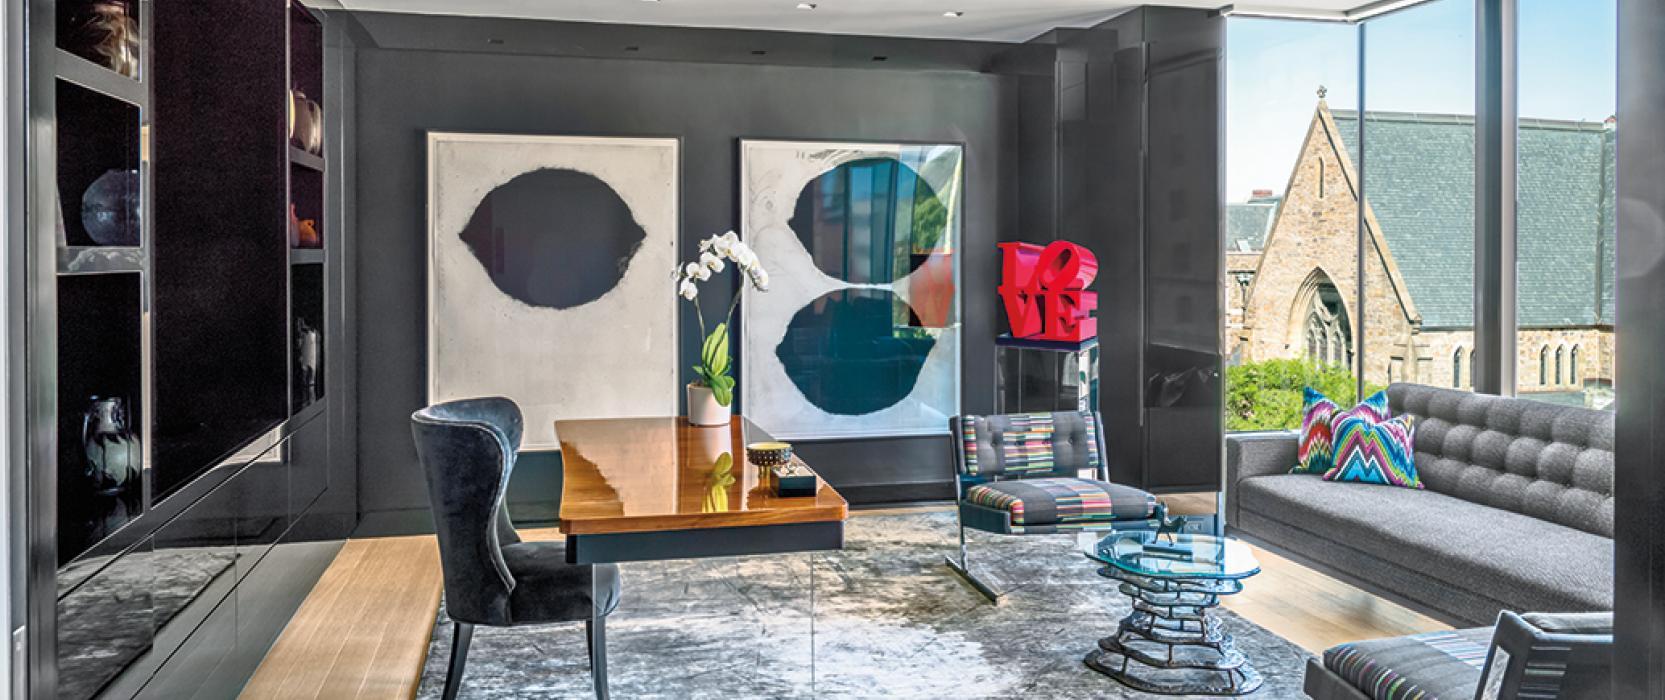 High End Condominium Design In Boston MA